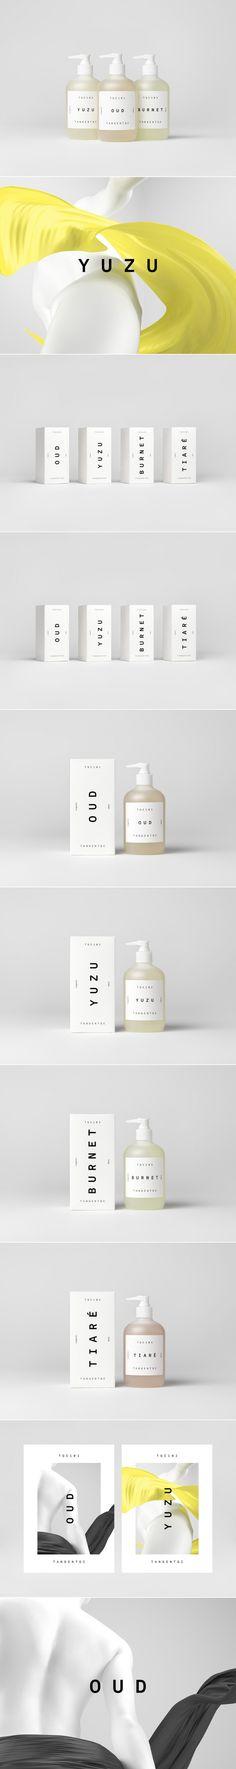 TANGENT GC organic soaps — The Dieline - Branding & Packaging Design